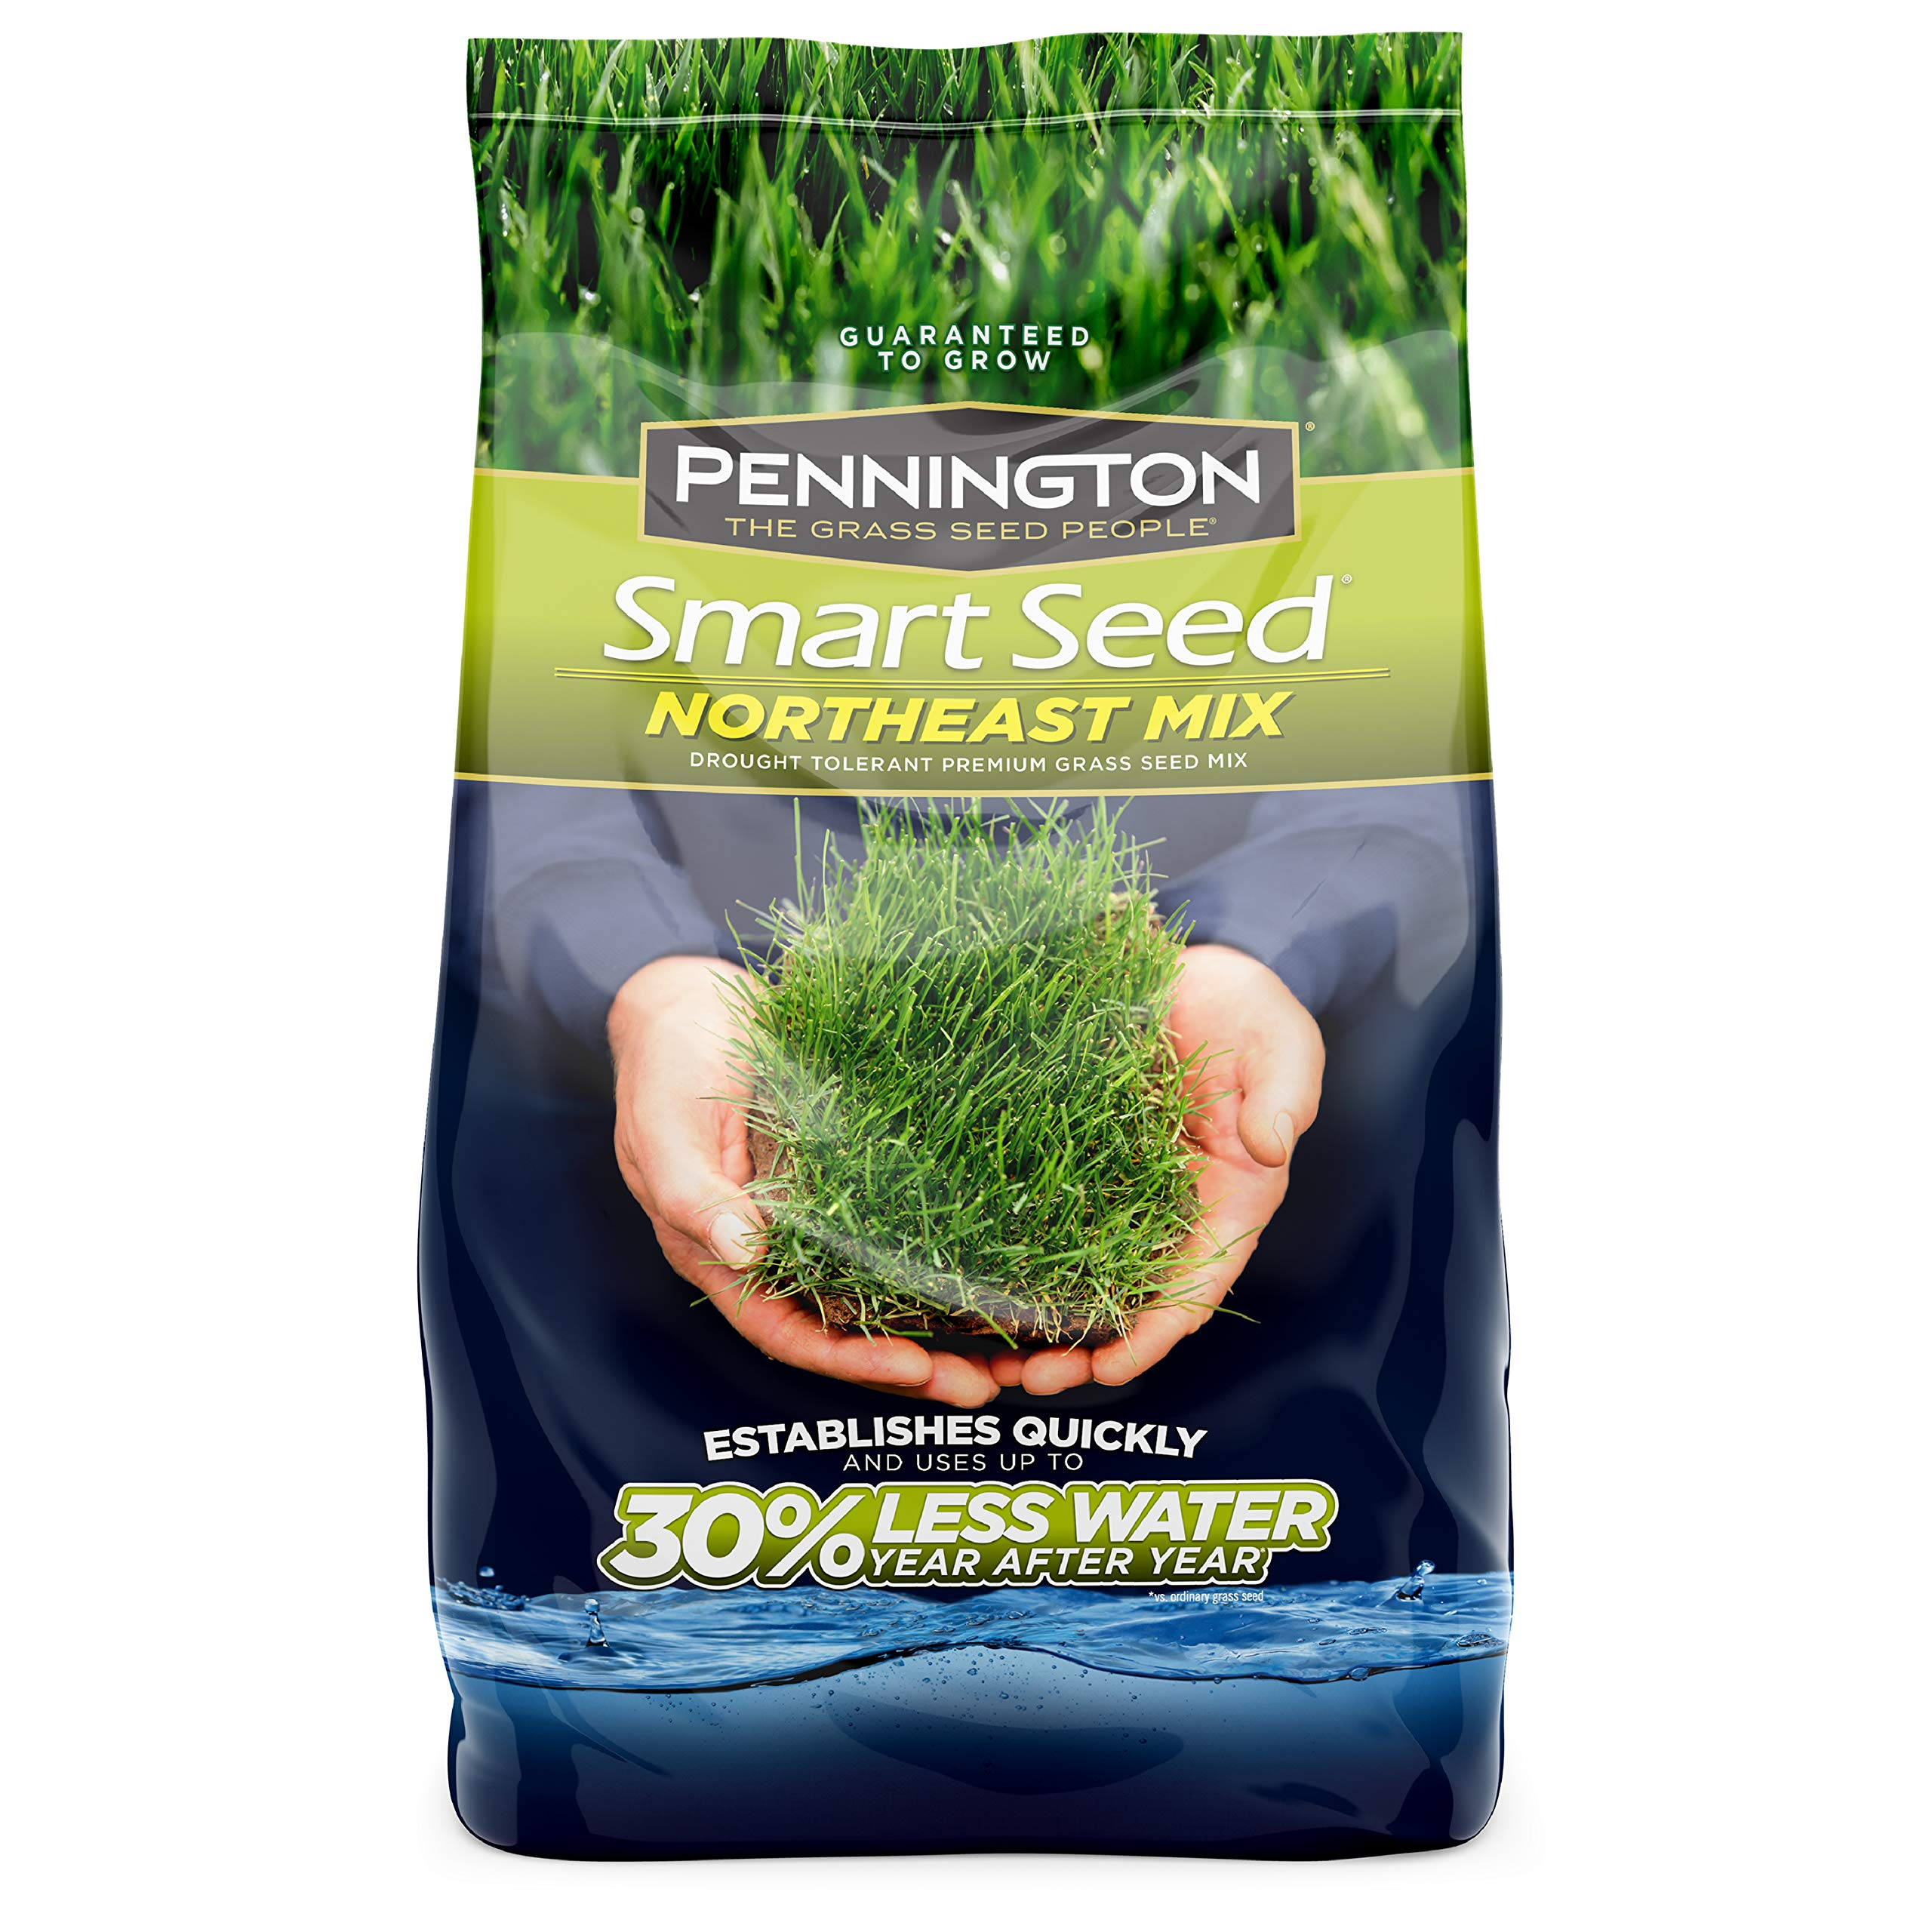 Pennington 100526638 Smart Seed Northeast Mix Grass Seed, 3 LB by Pennington